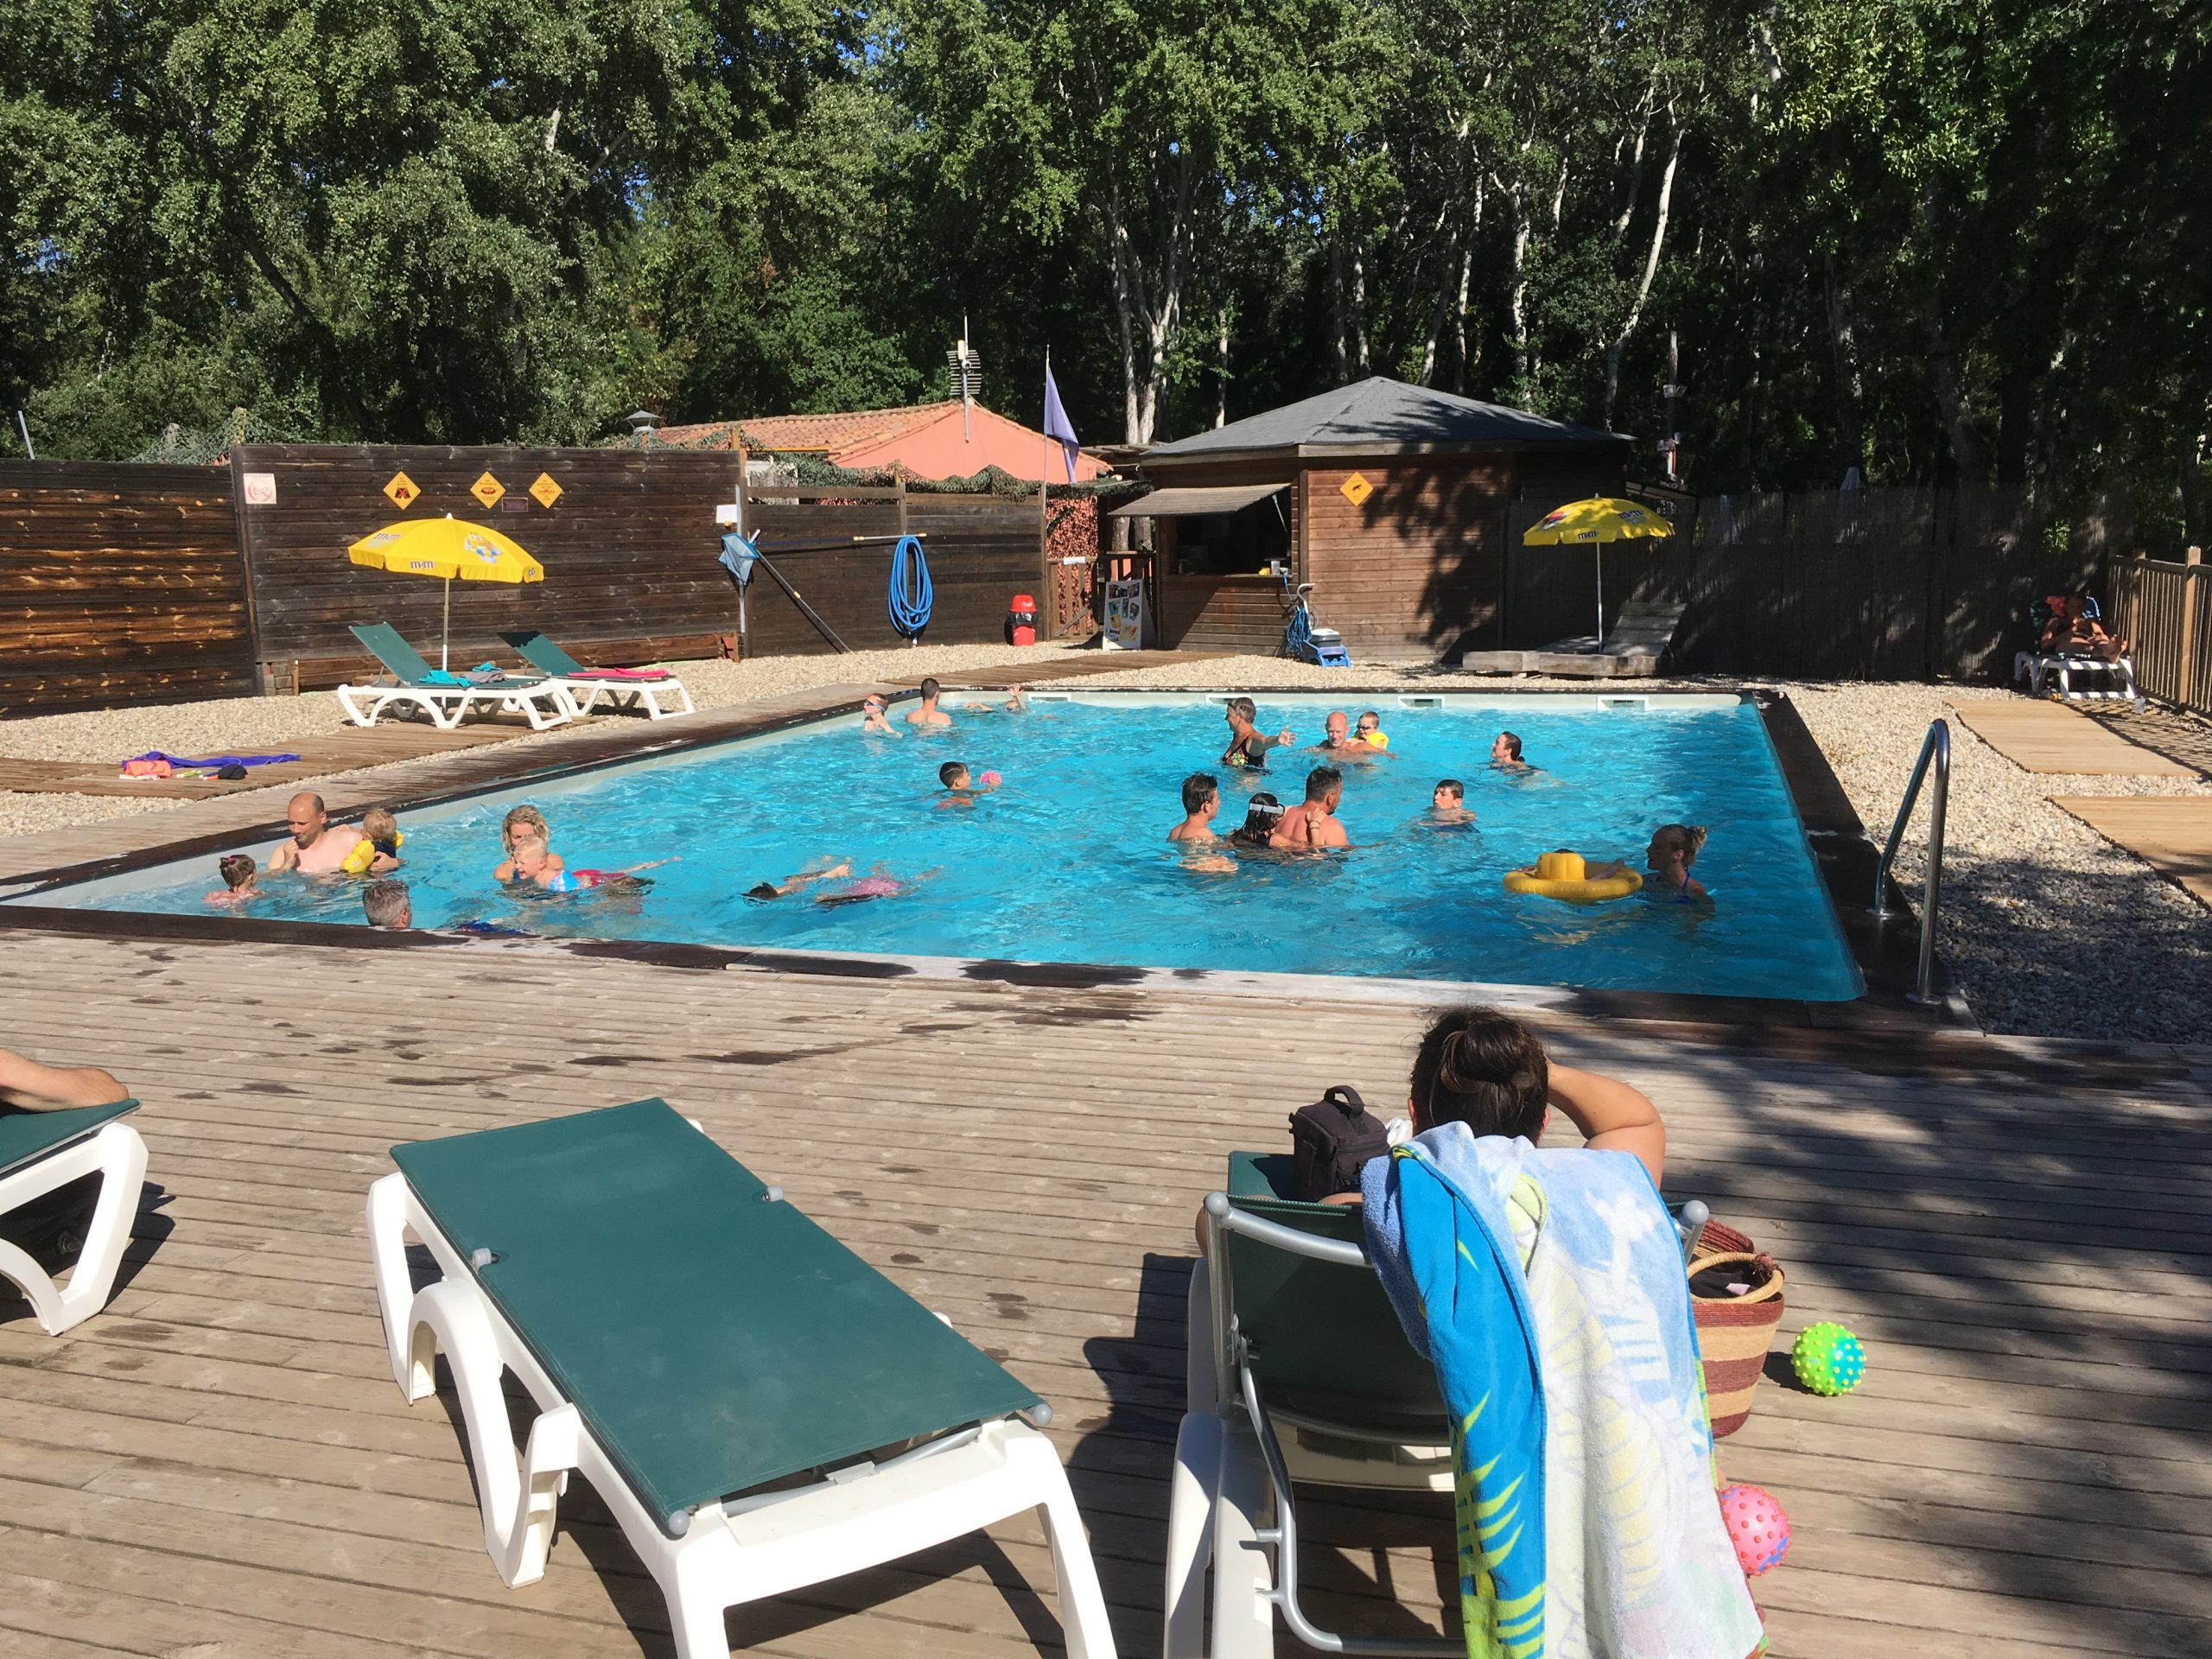 Camping L'art De Vivre - Avignon Tourisme - Avignon Tourisme concernant Cash Piscine Avignon